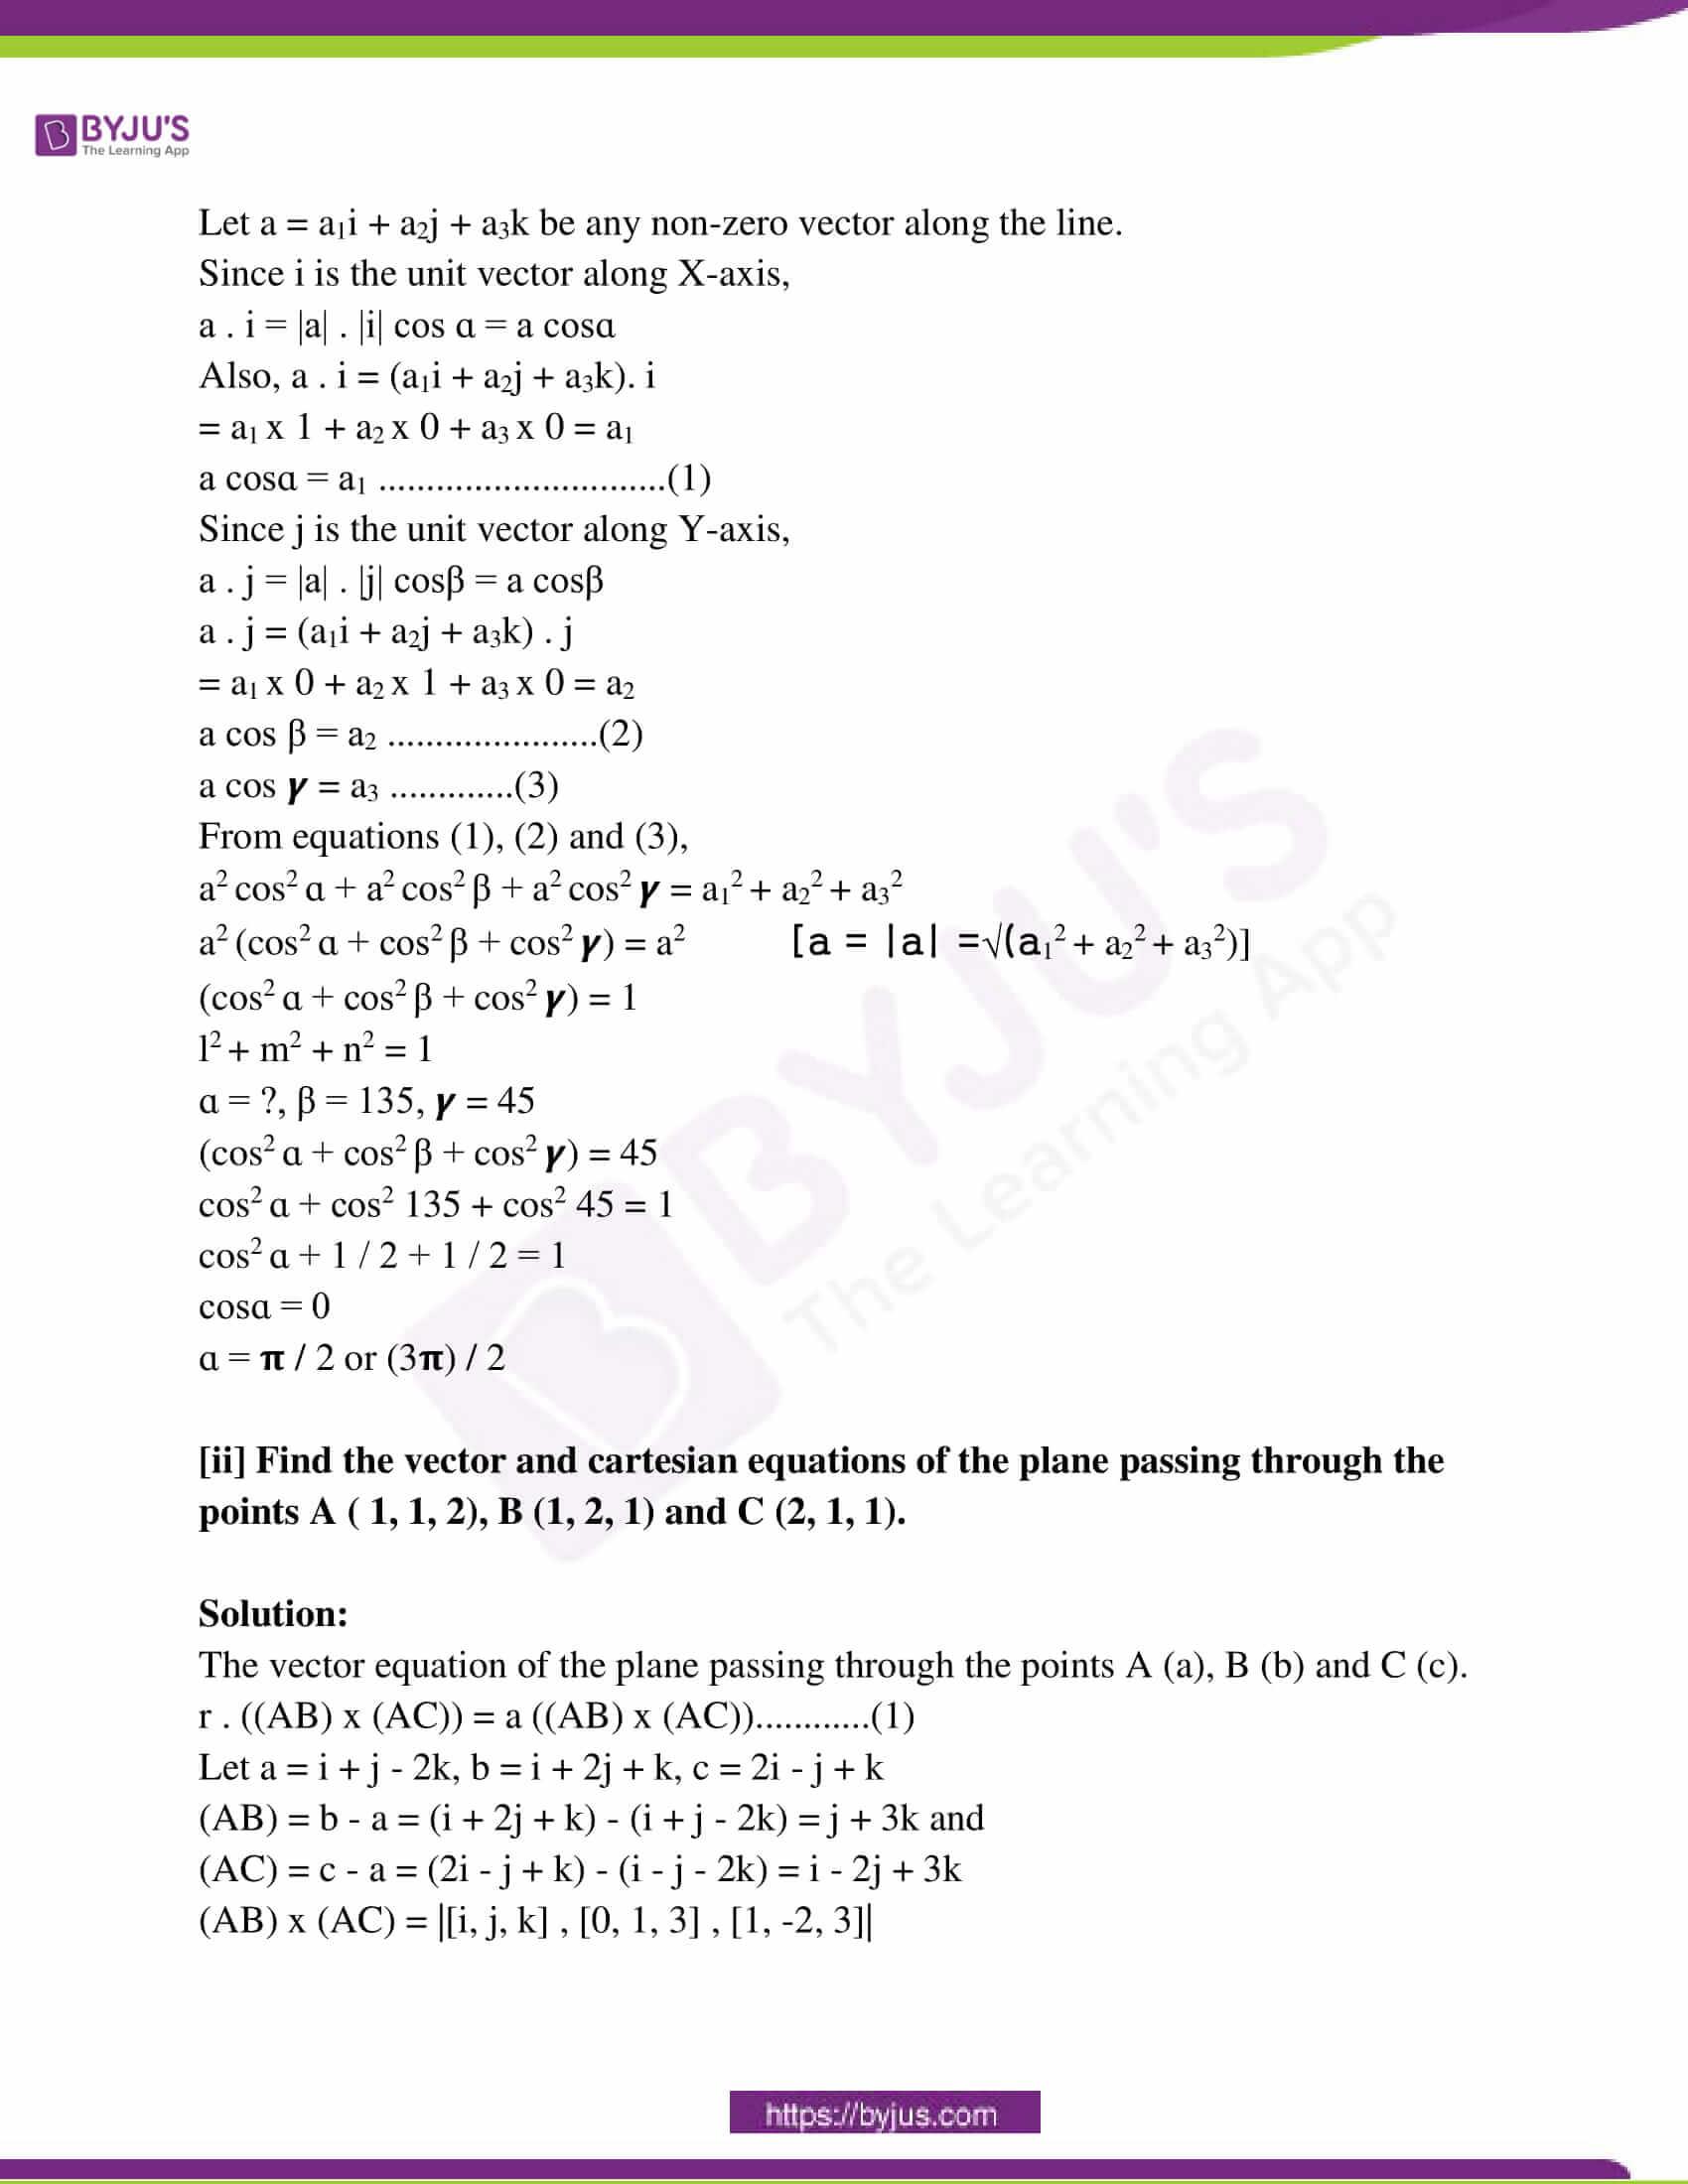 maharashtra class 12 exam question paper solutions march 2017 13